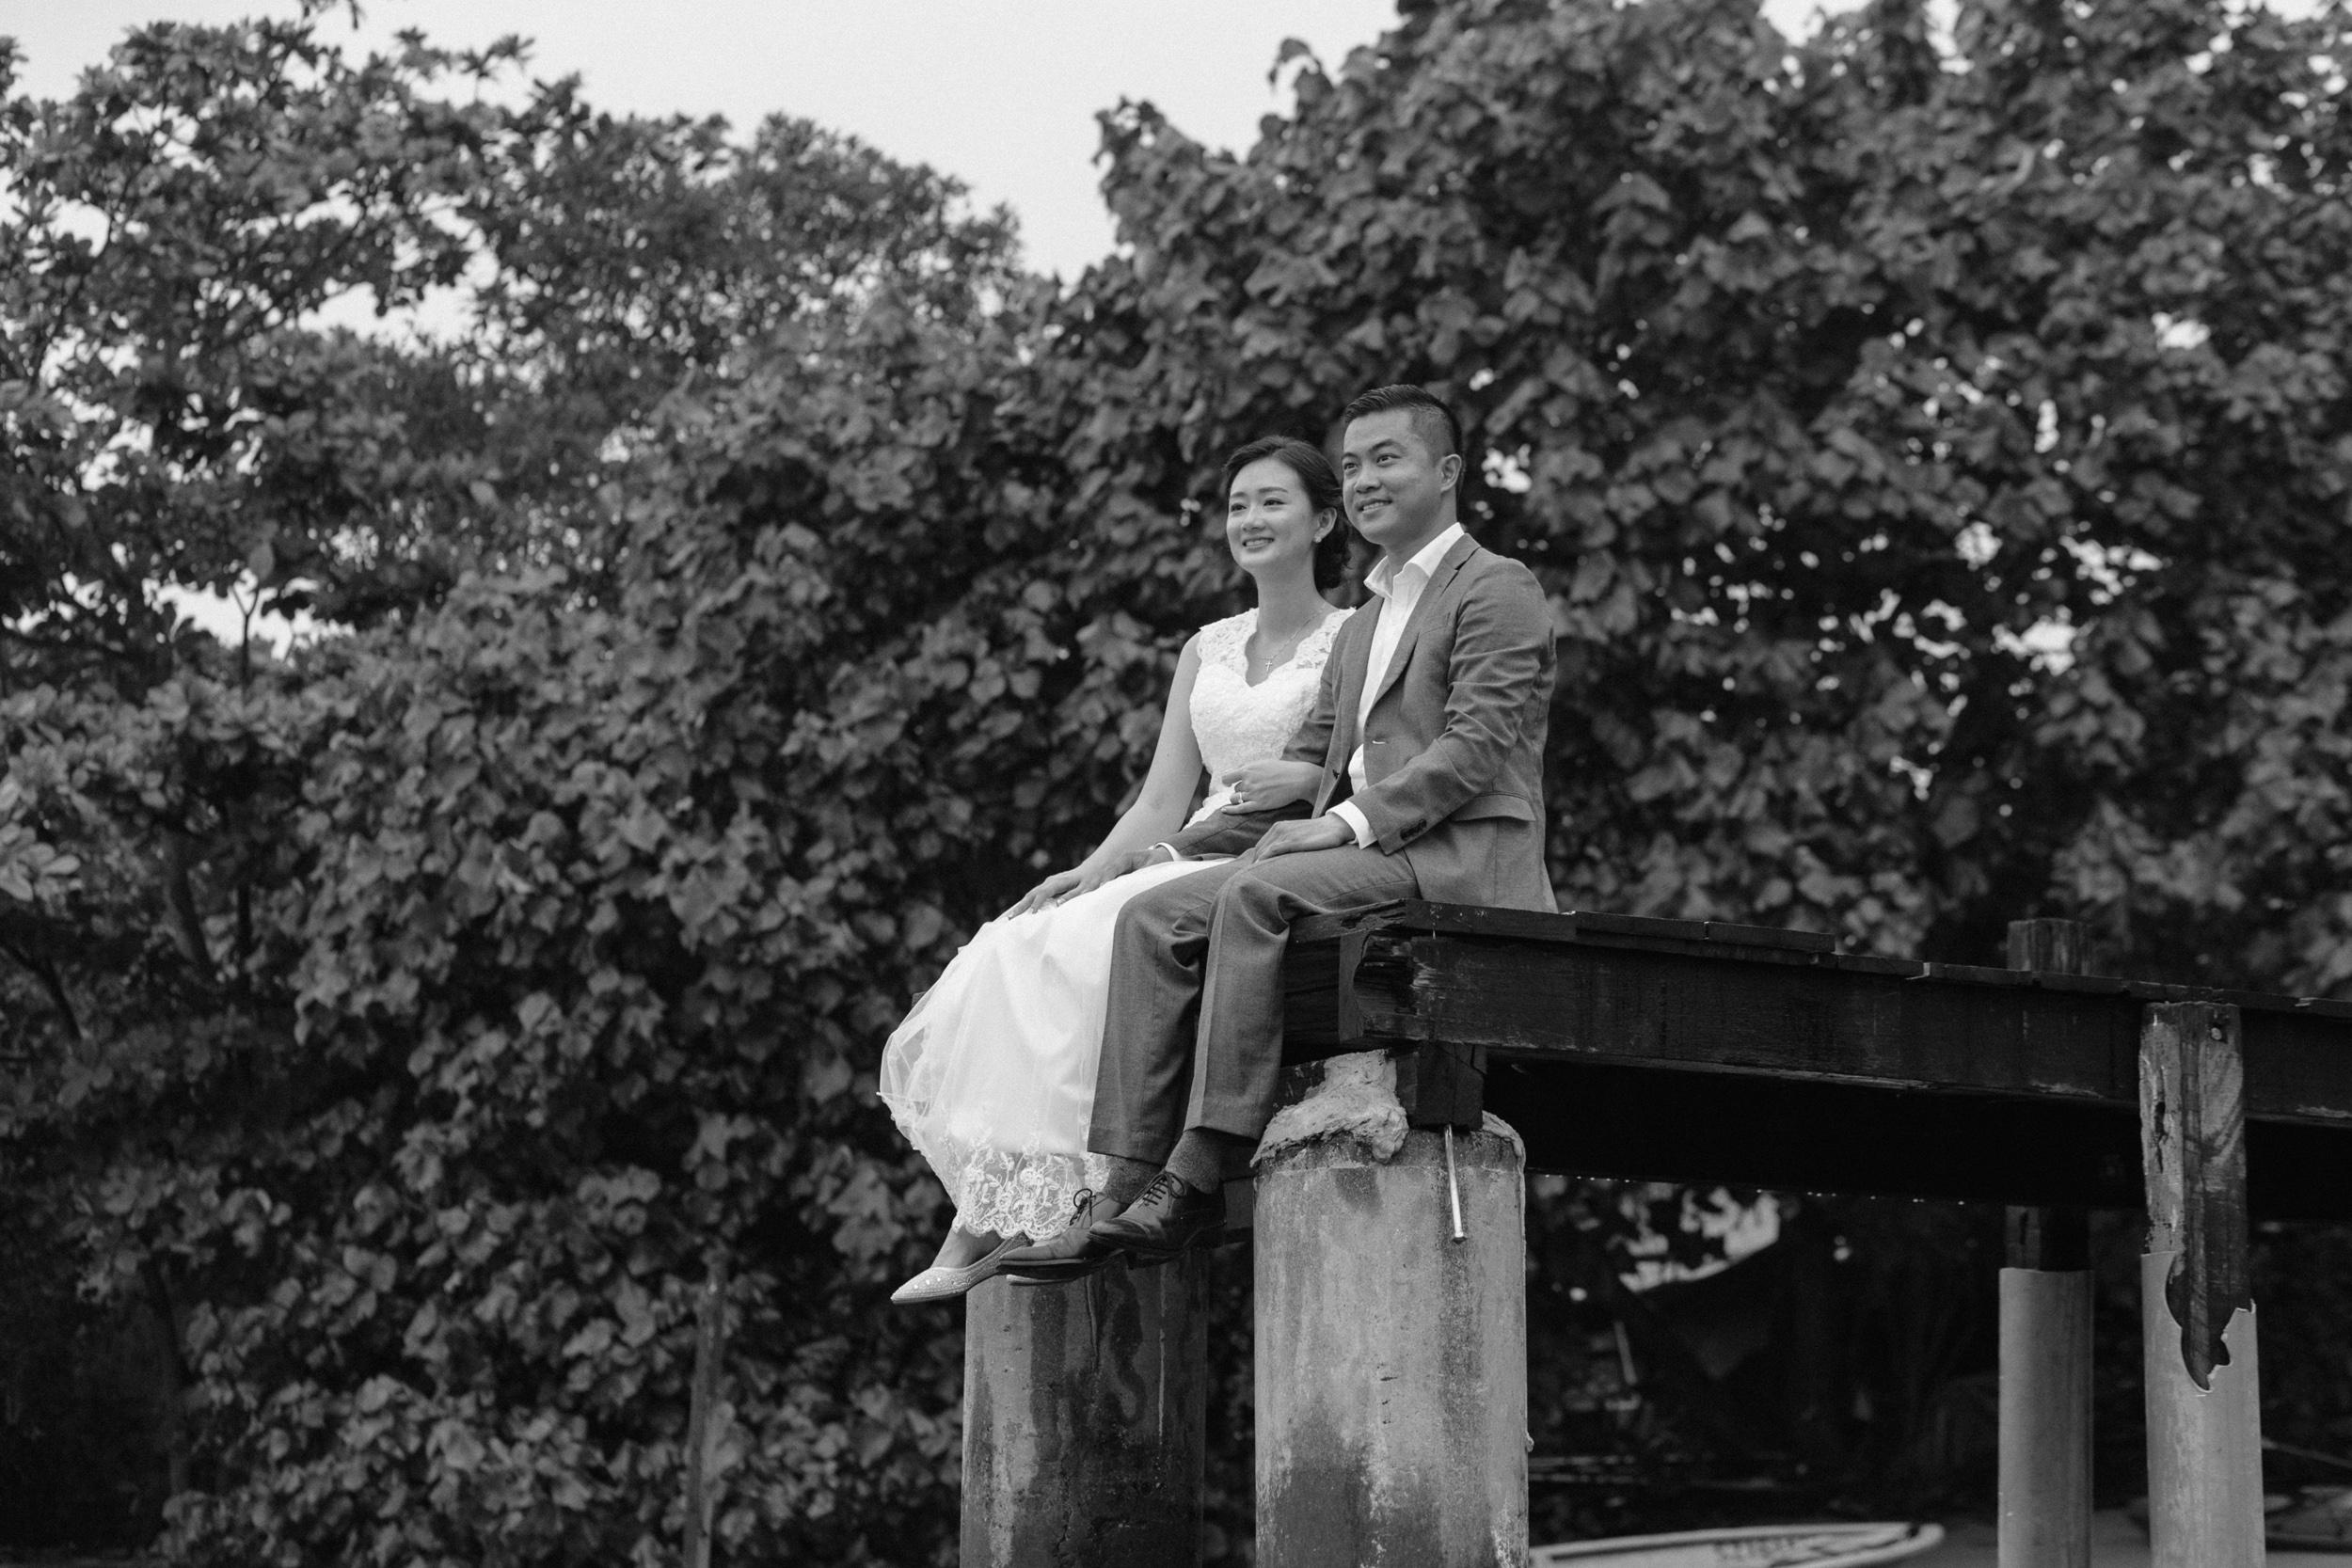 singapore-wedding-photographer-wemadethese-junekit-kingslin-16.jpg